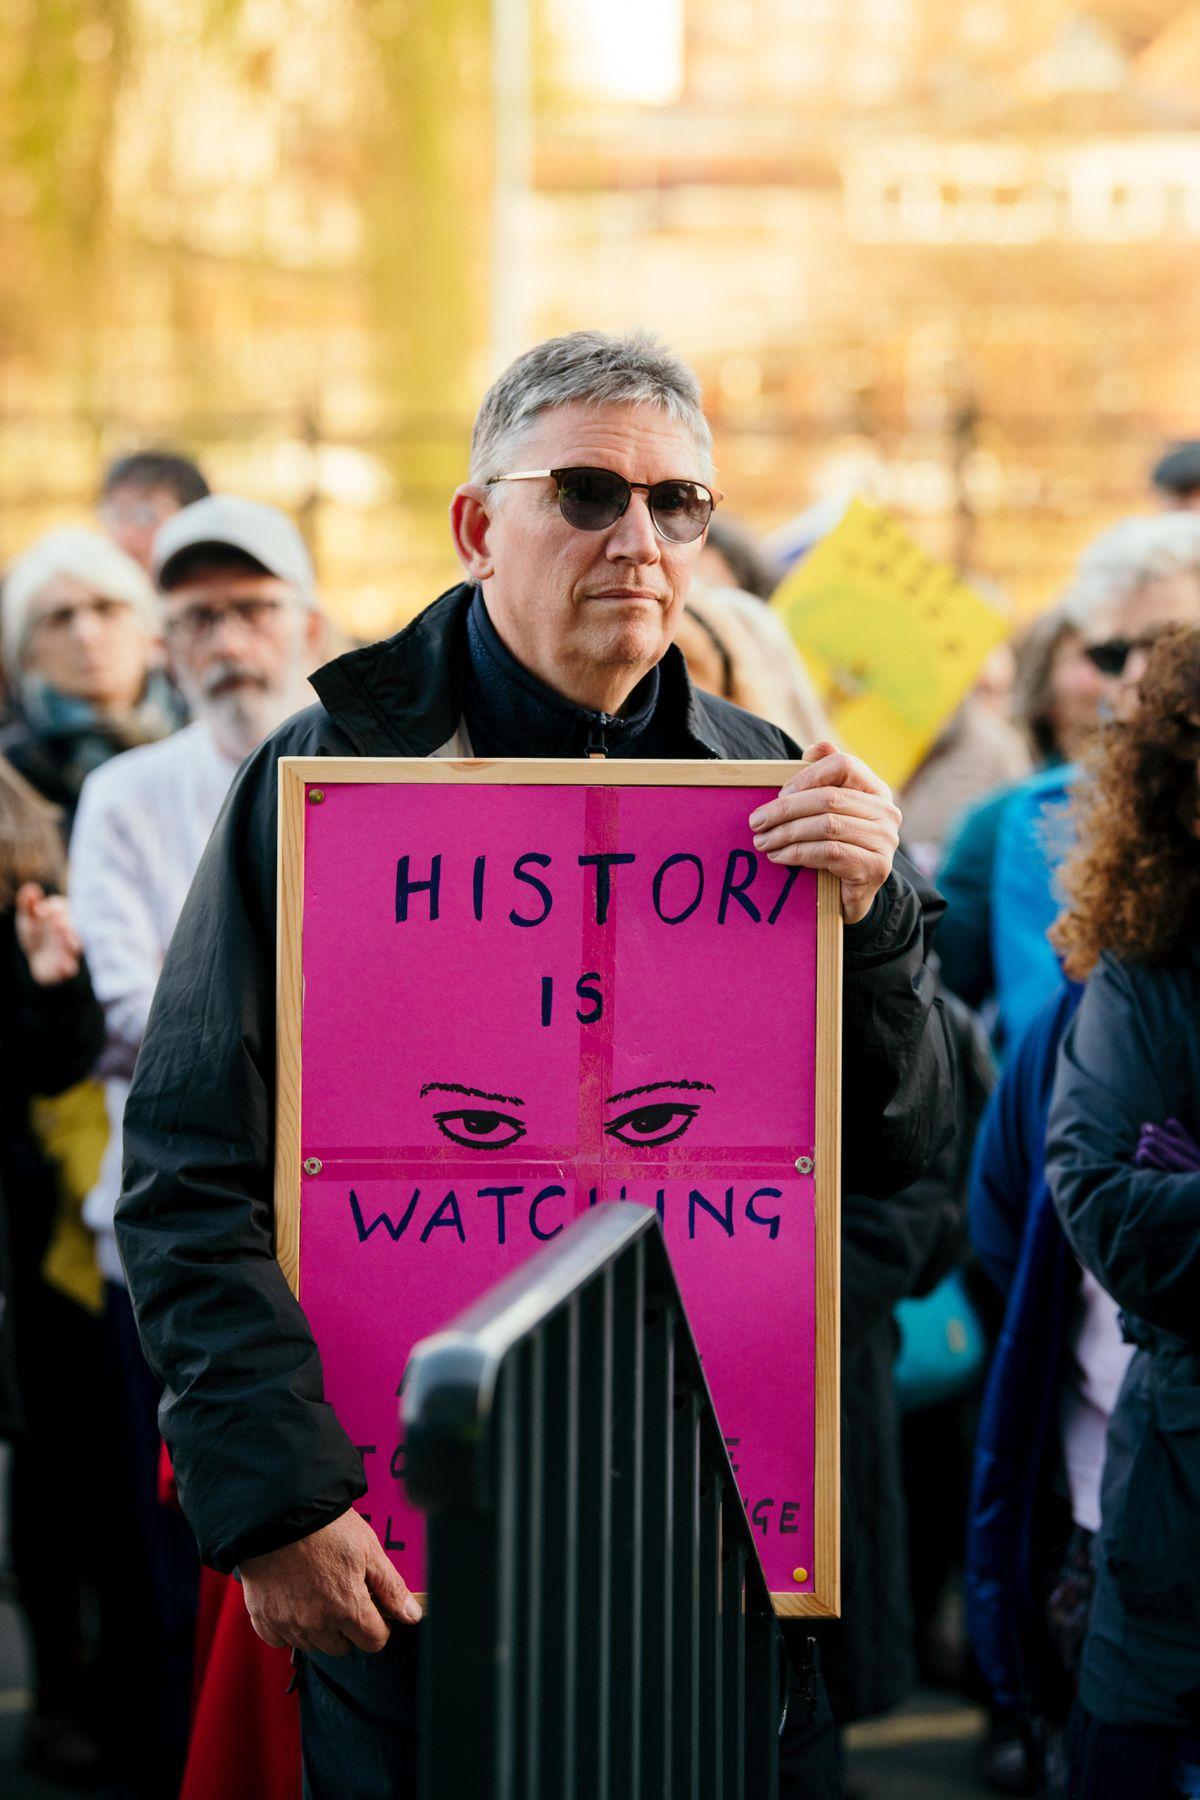 A demonstrator